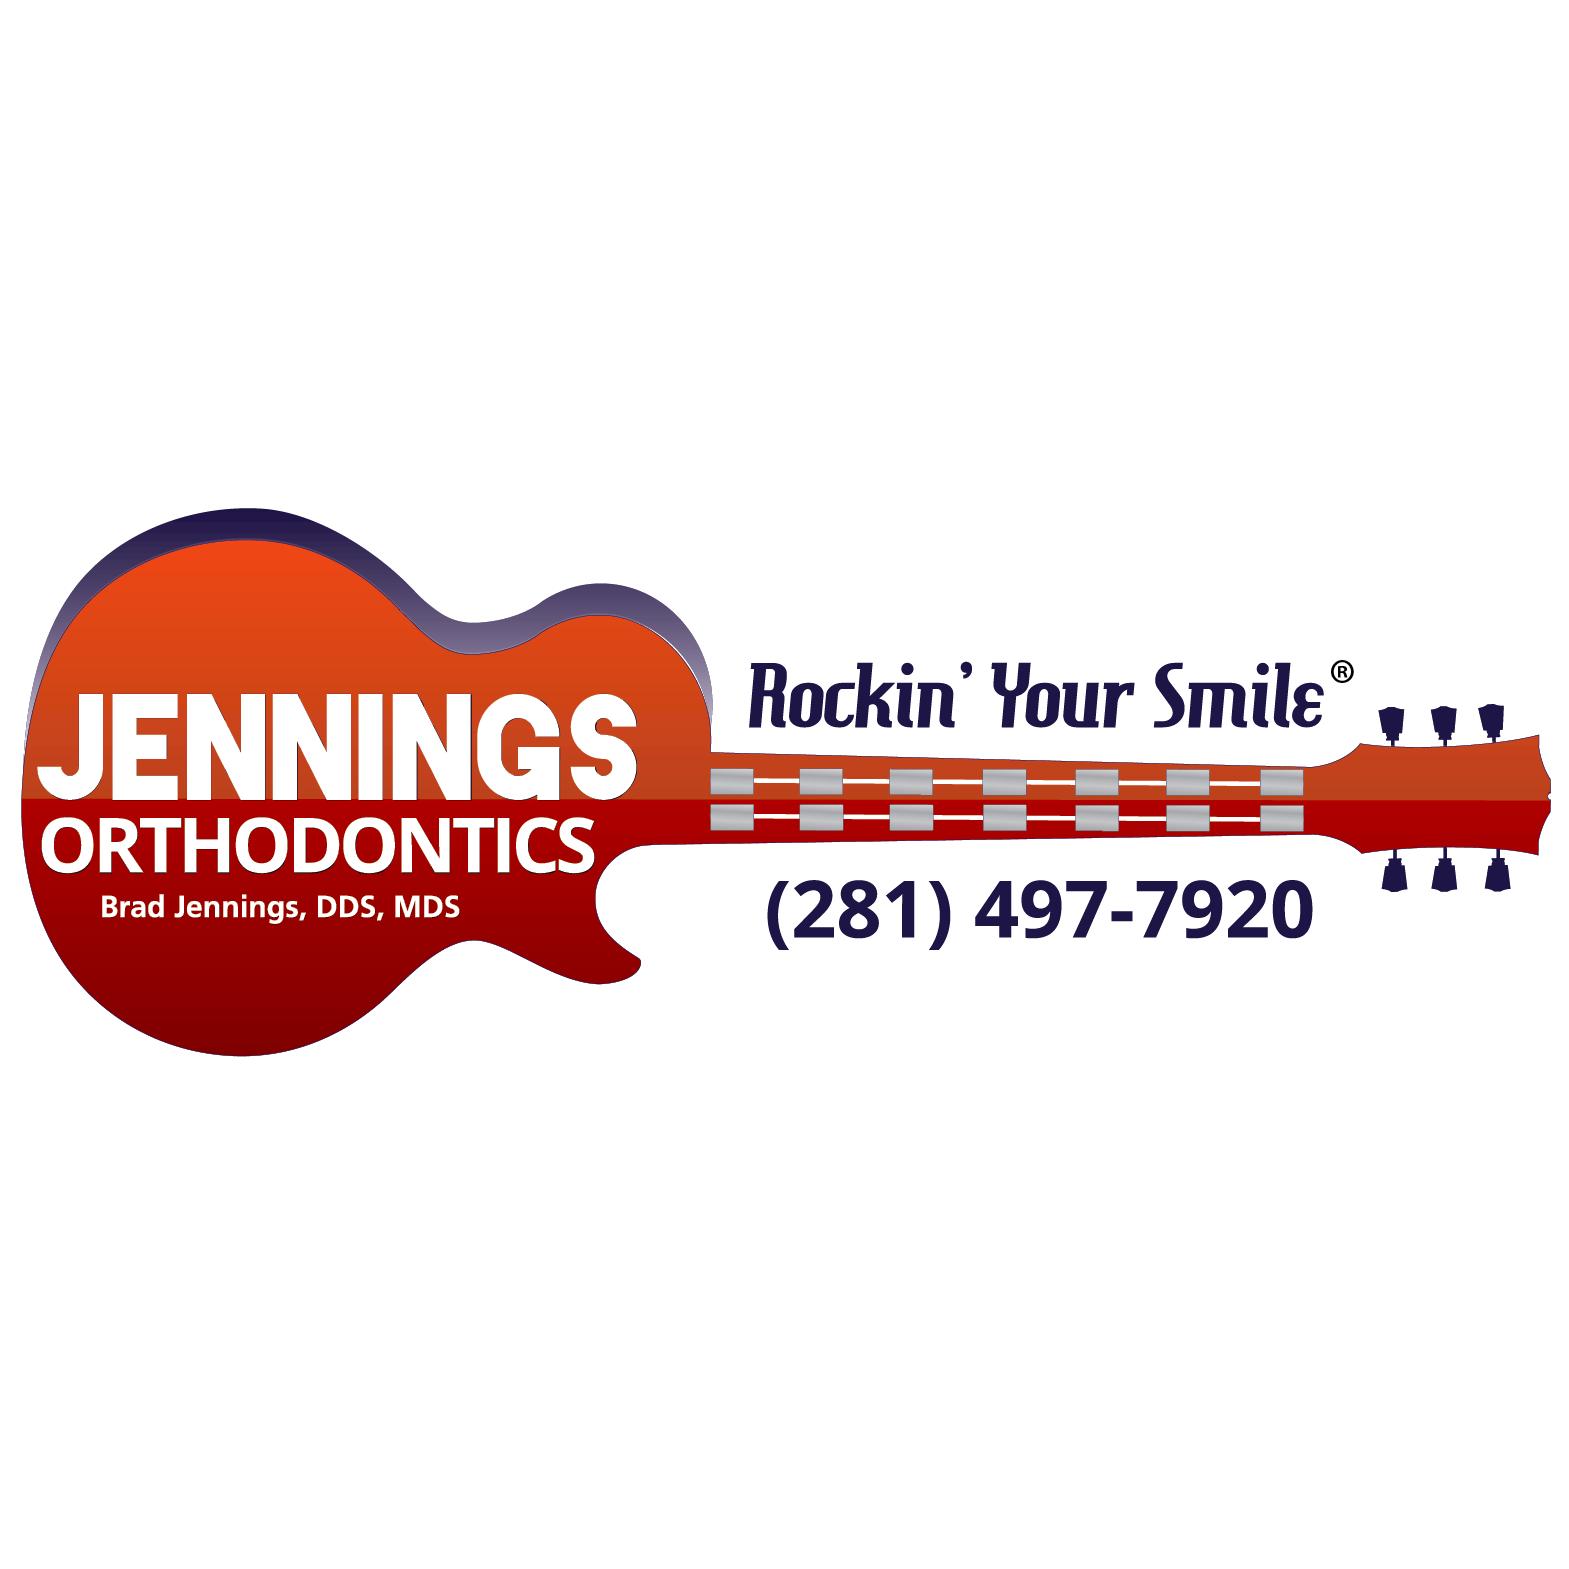 Jennings Orthodontics image 4